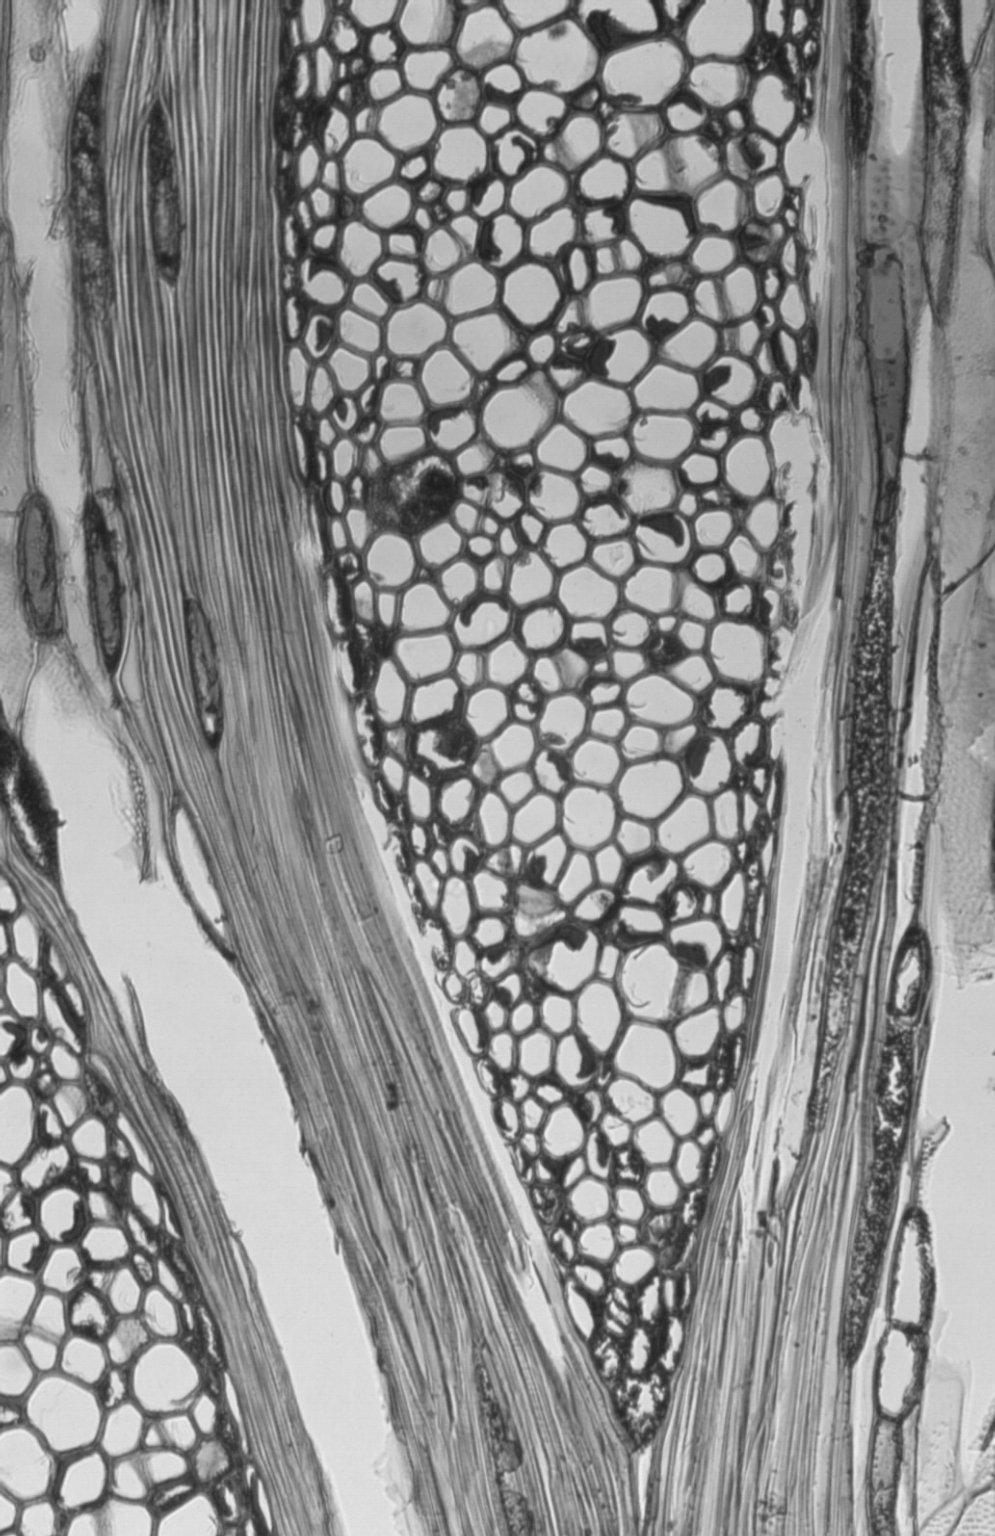 PROTEACEAE Banksia integrifolia